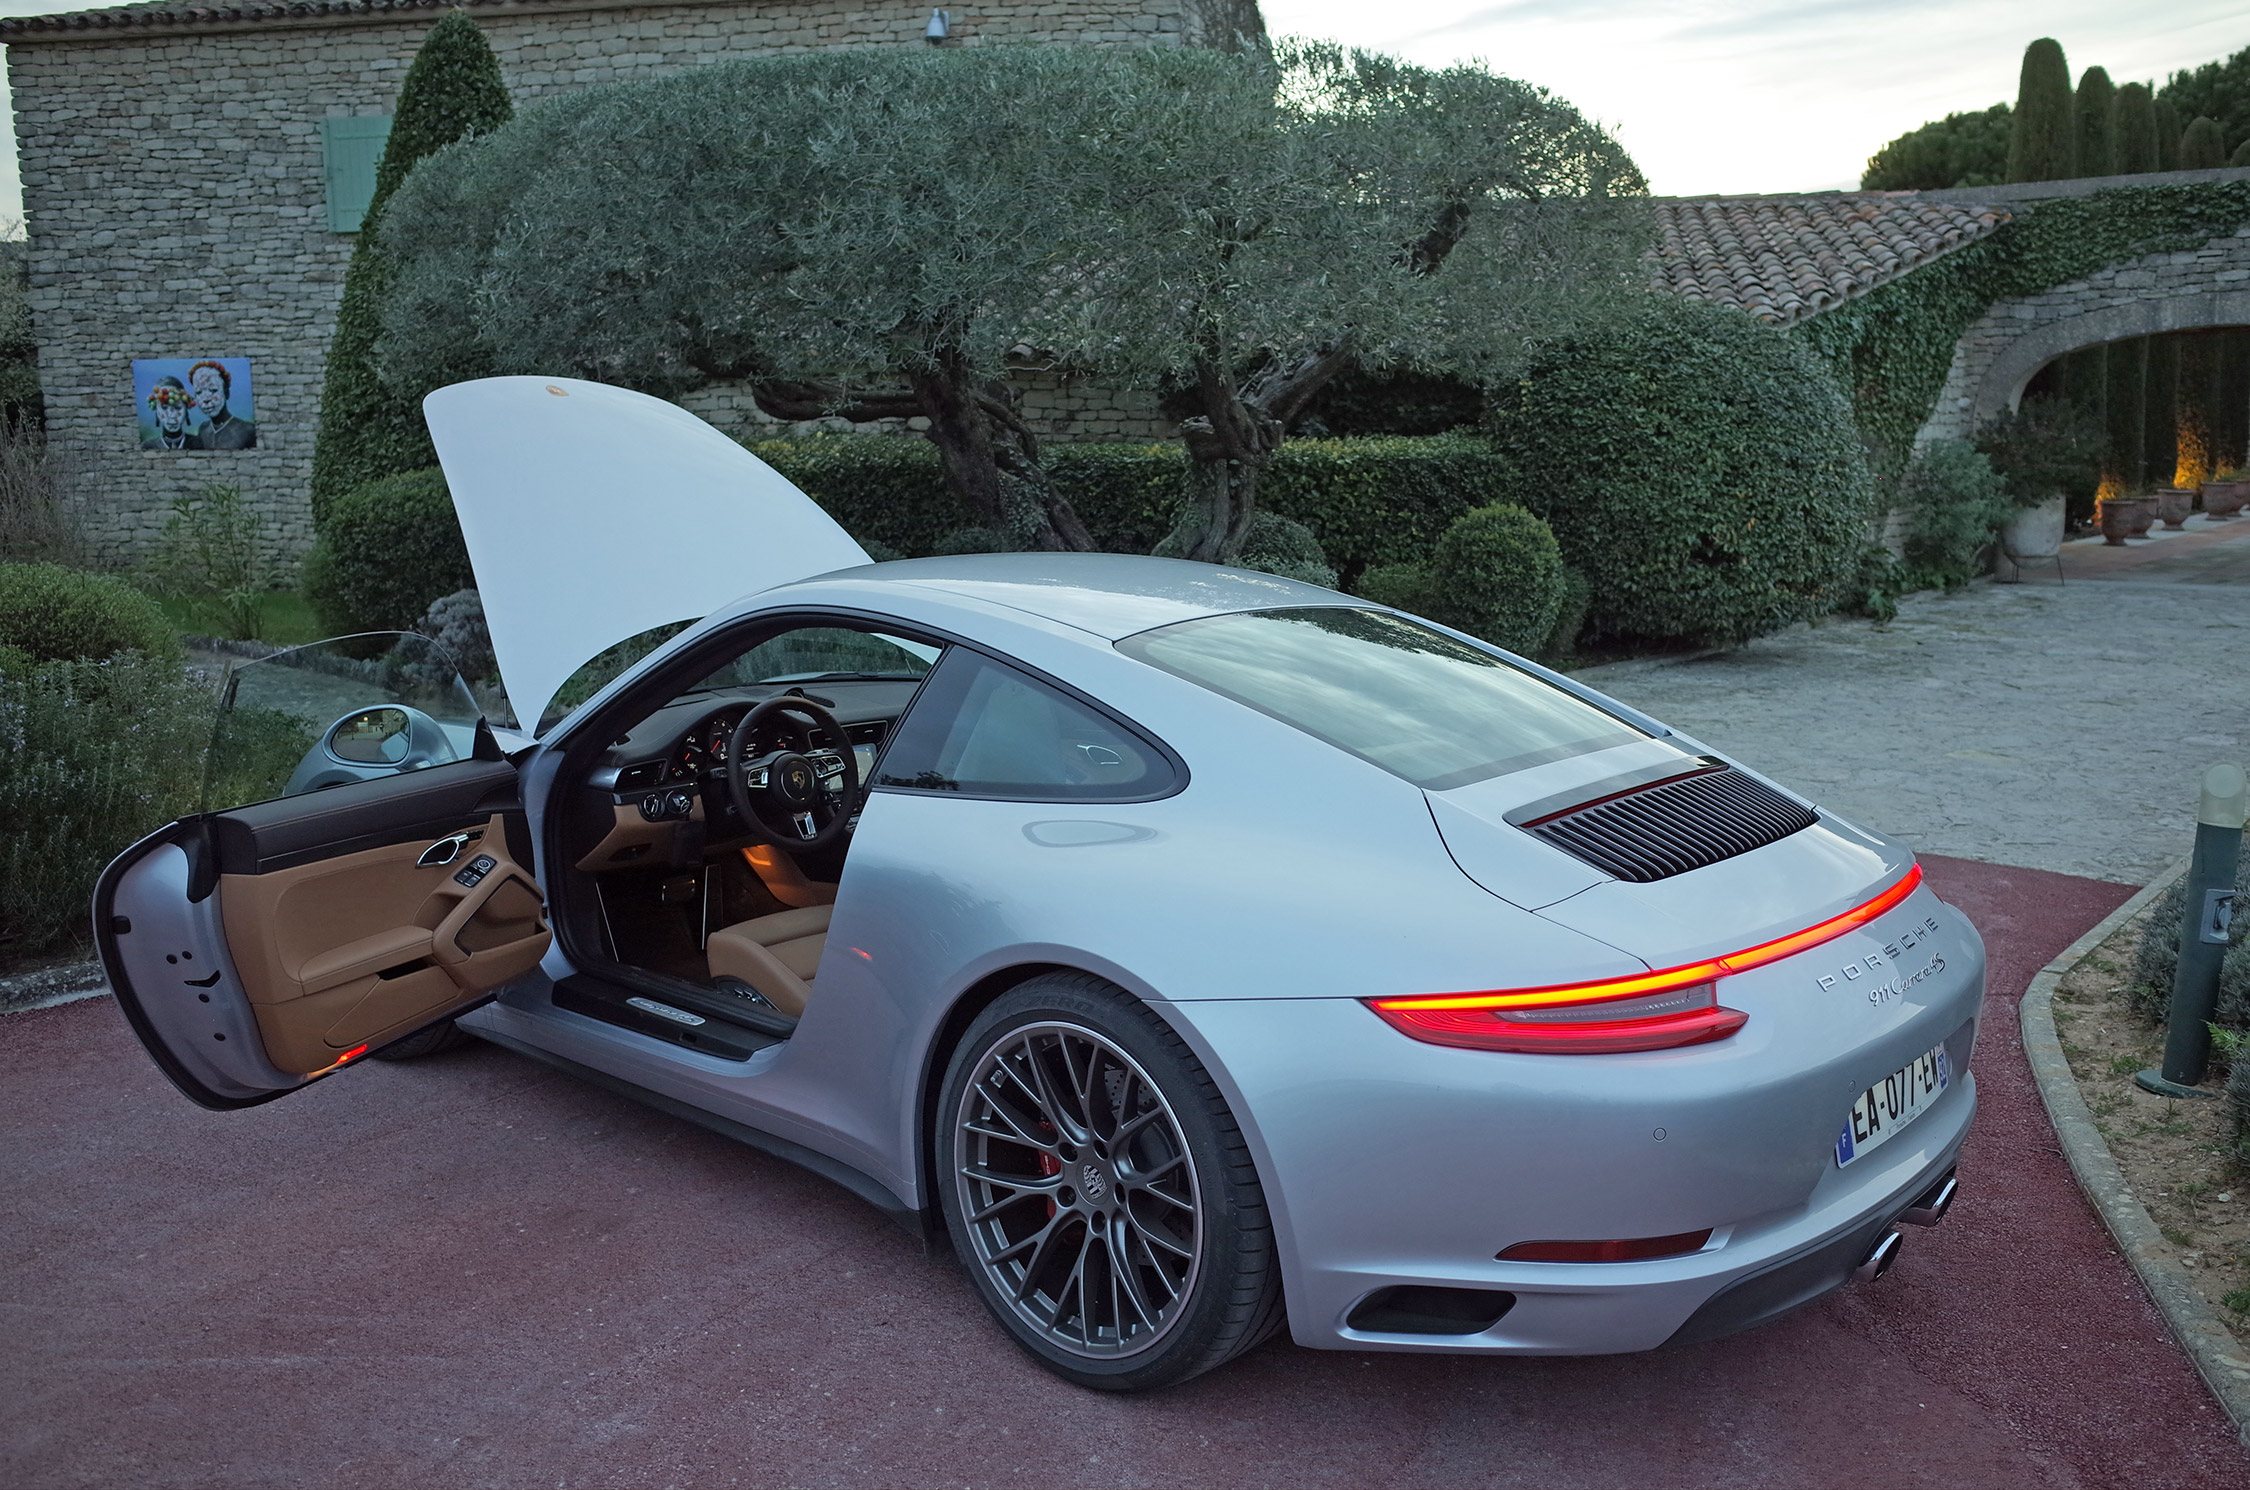 essai porsche 911 991 carrera 4s 420 ch motorlegend. Black Bedroom Furniture Sets. Home Design Ideas